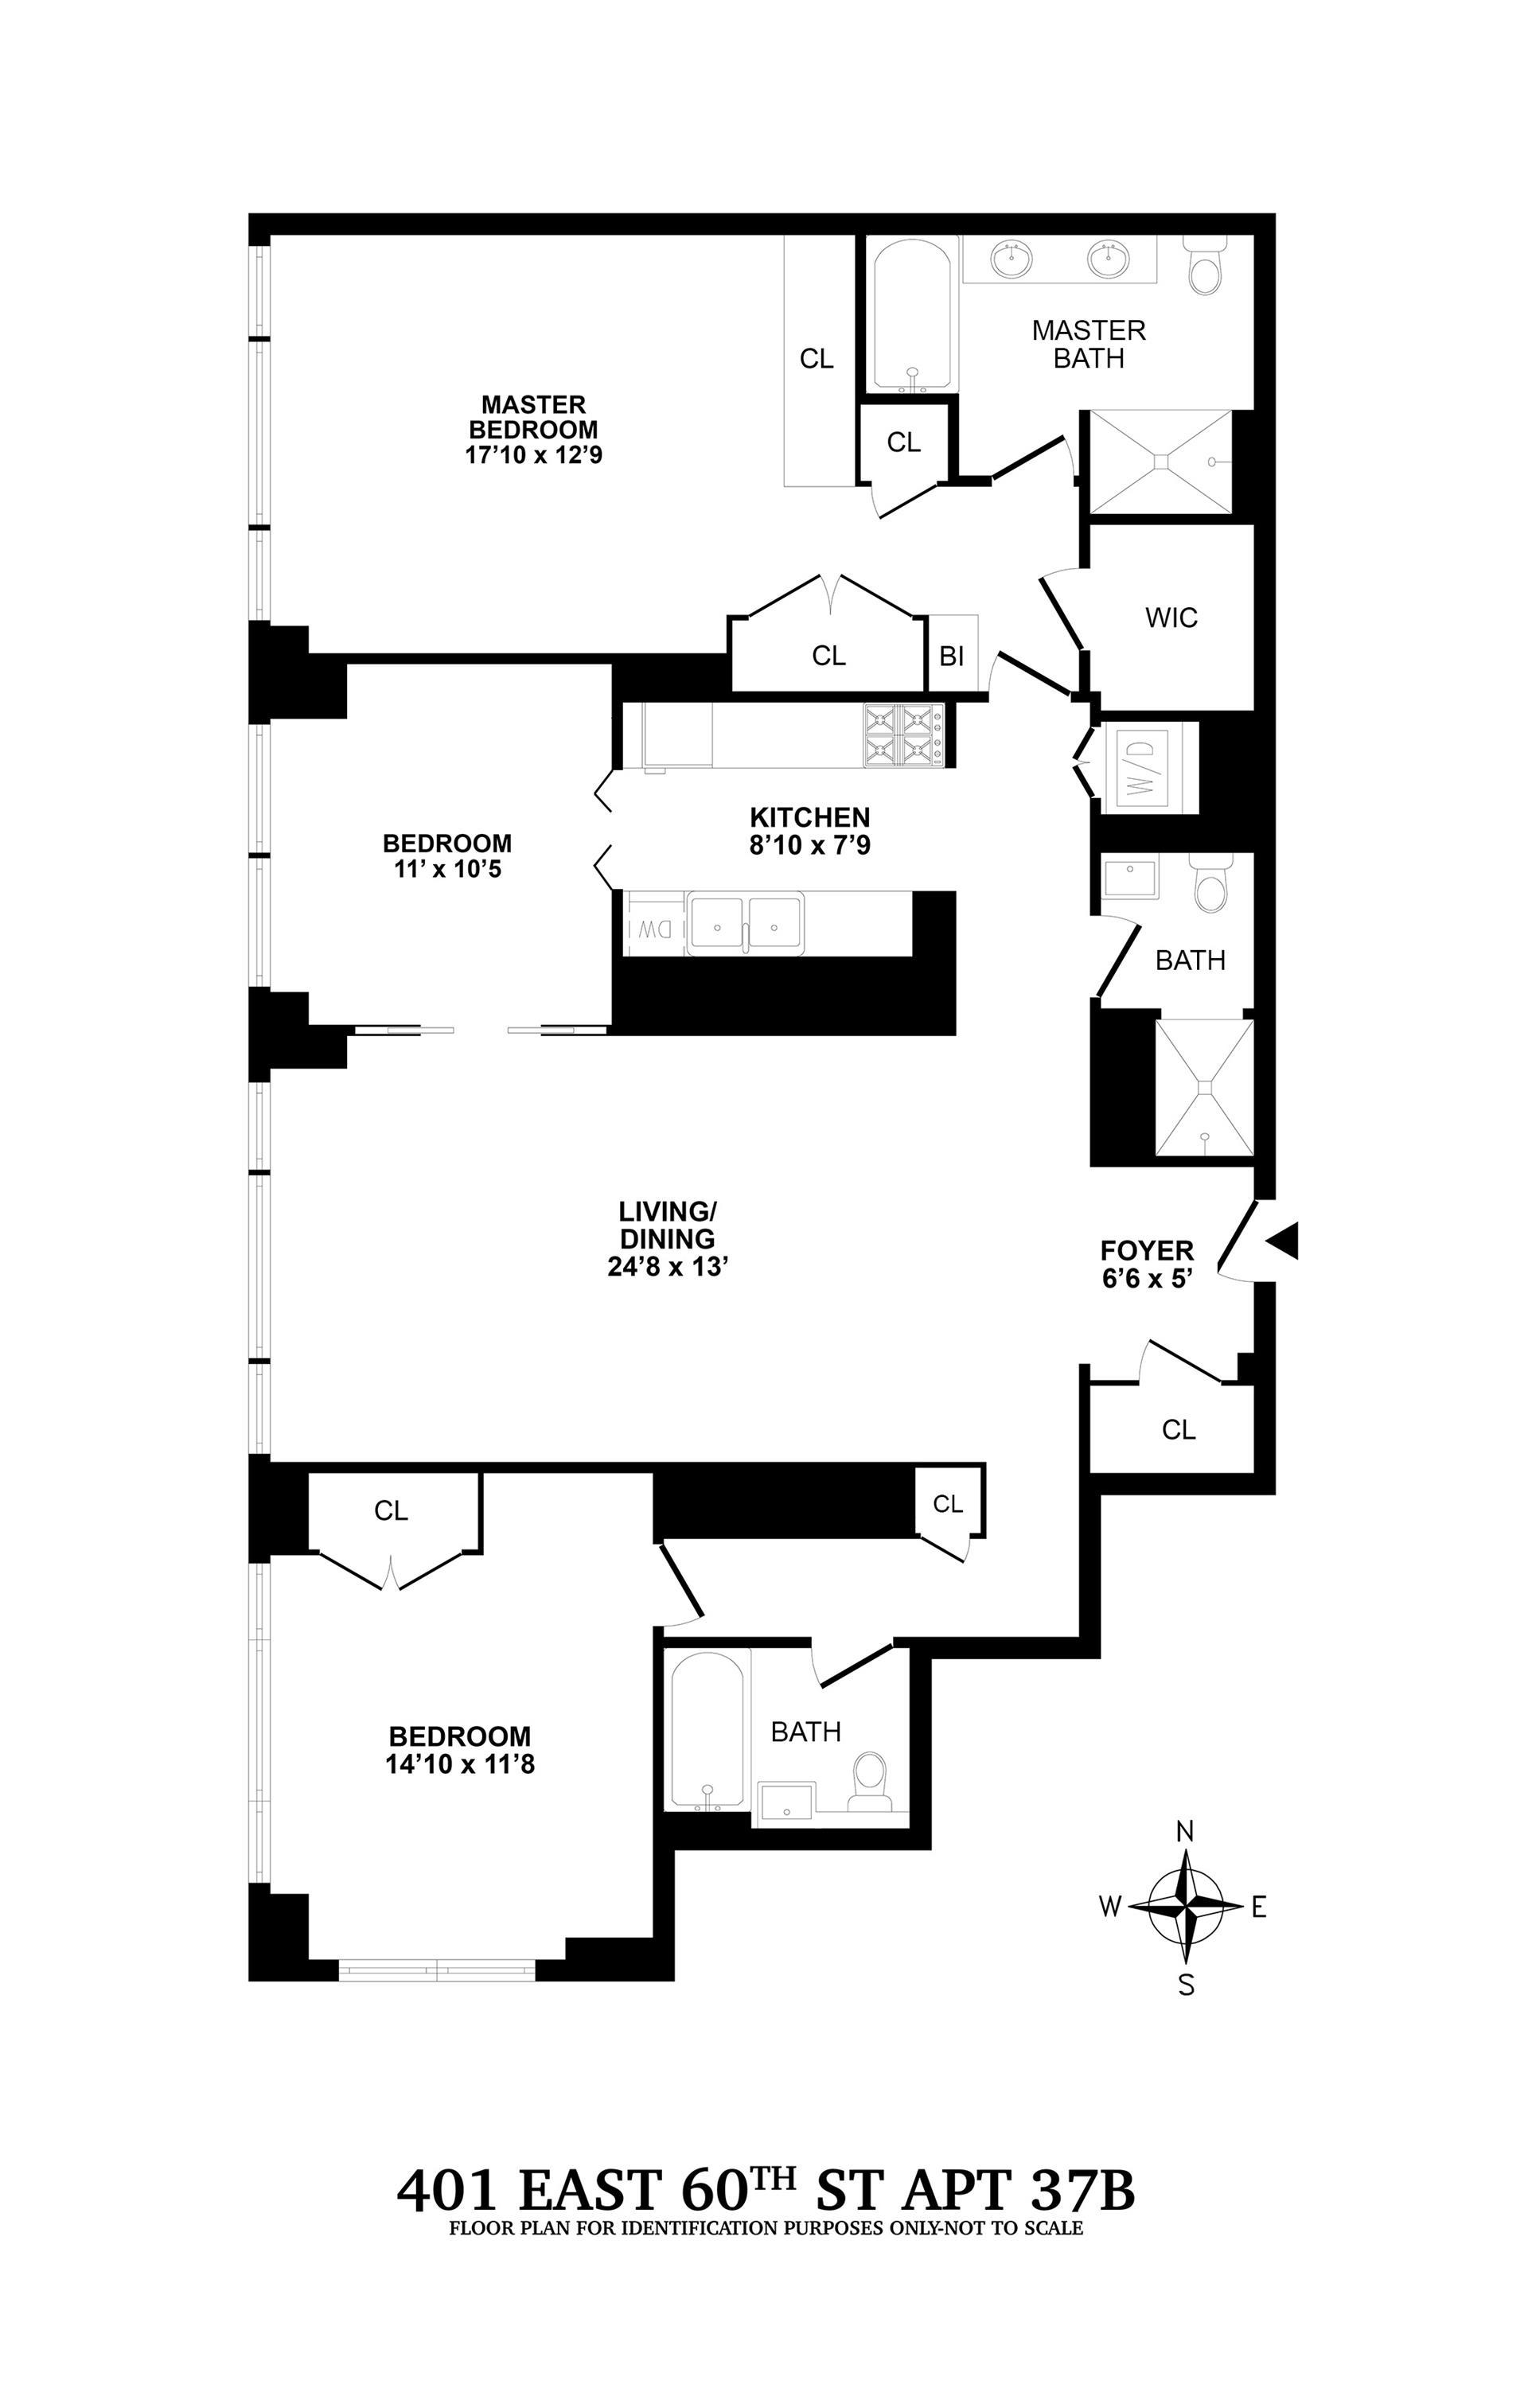 Floor plan of 401 East 60th Street, 37B - Upper East Side, New York